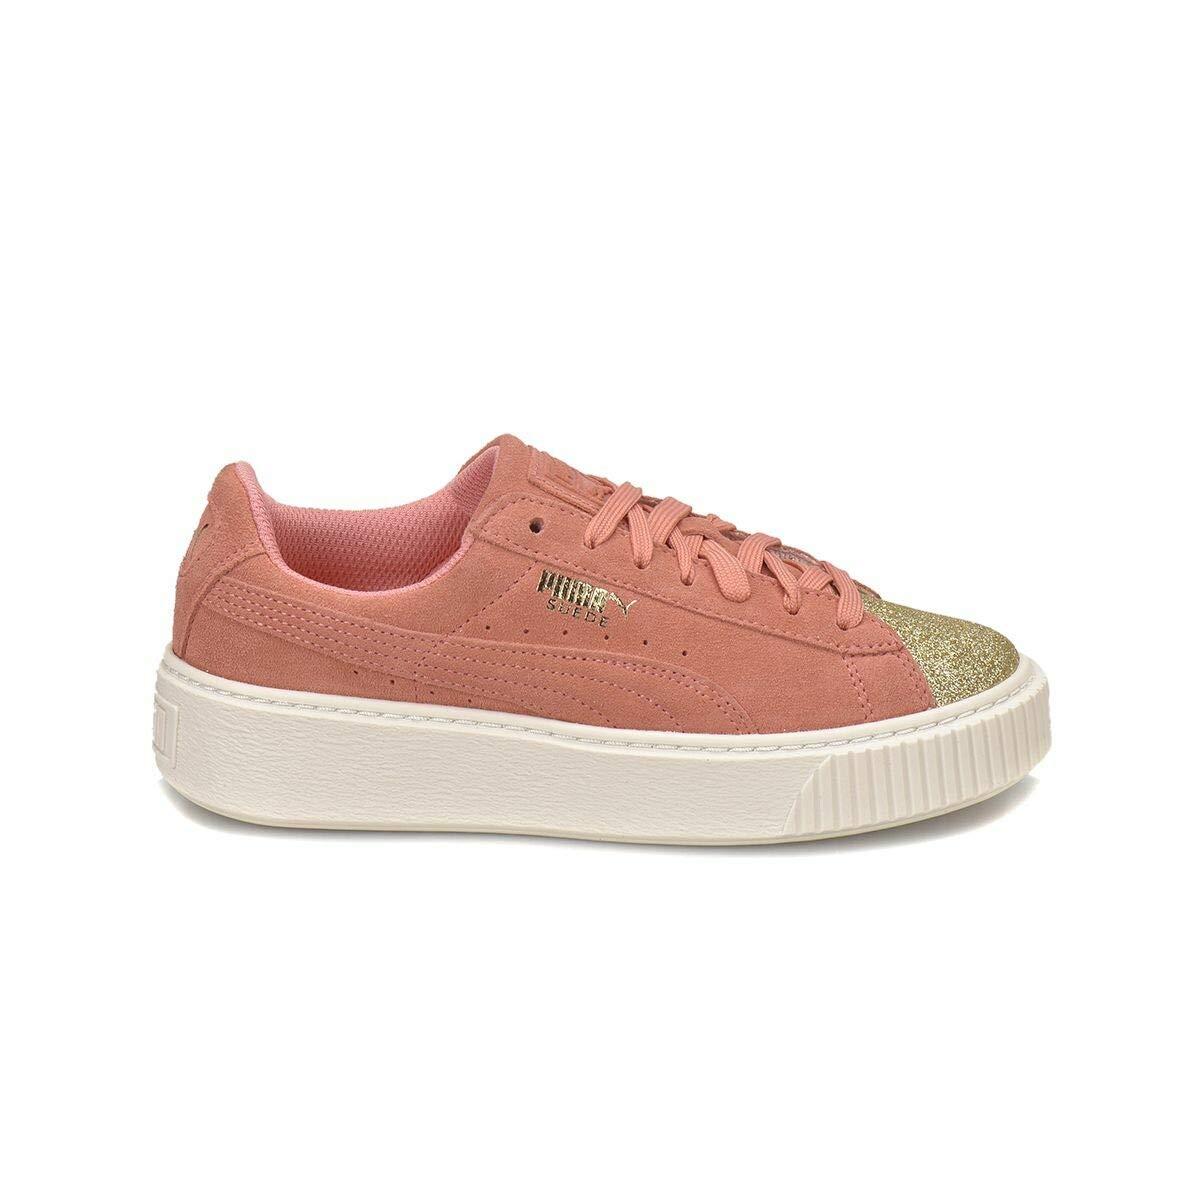 Puma Suede Platform Glam Jr 36492105 Damen Sneakers (37.5